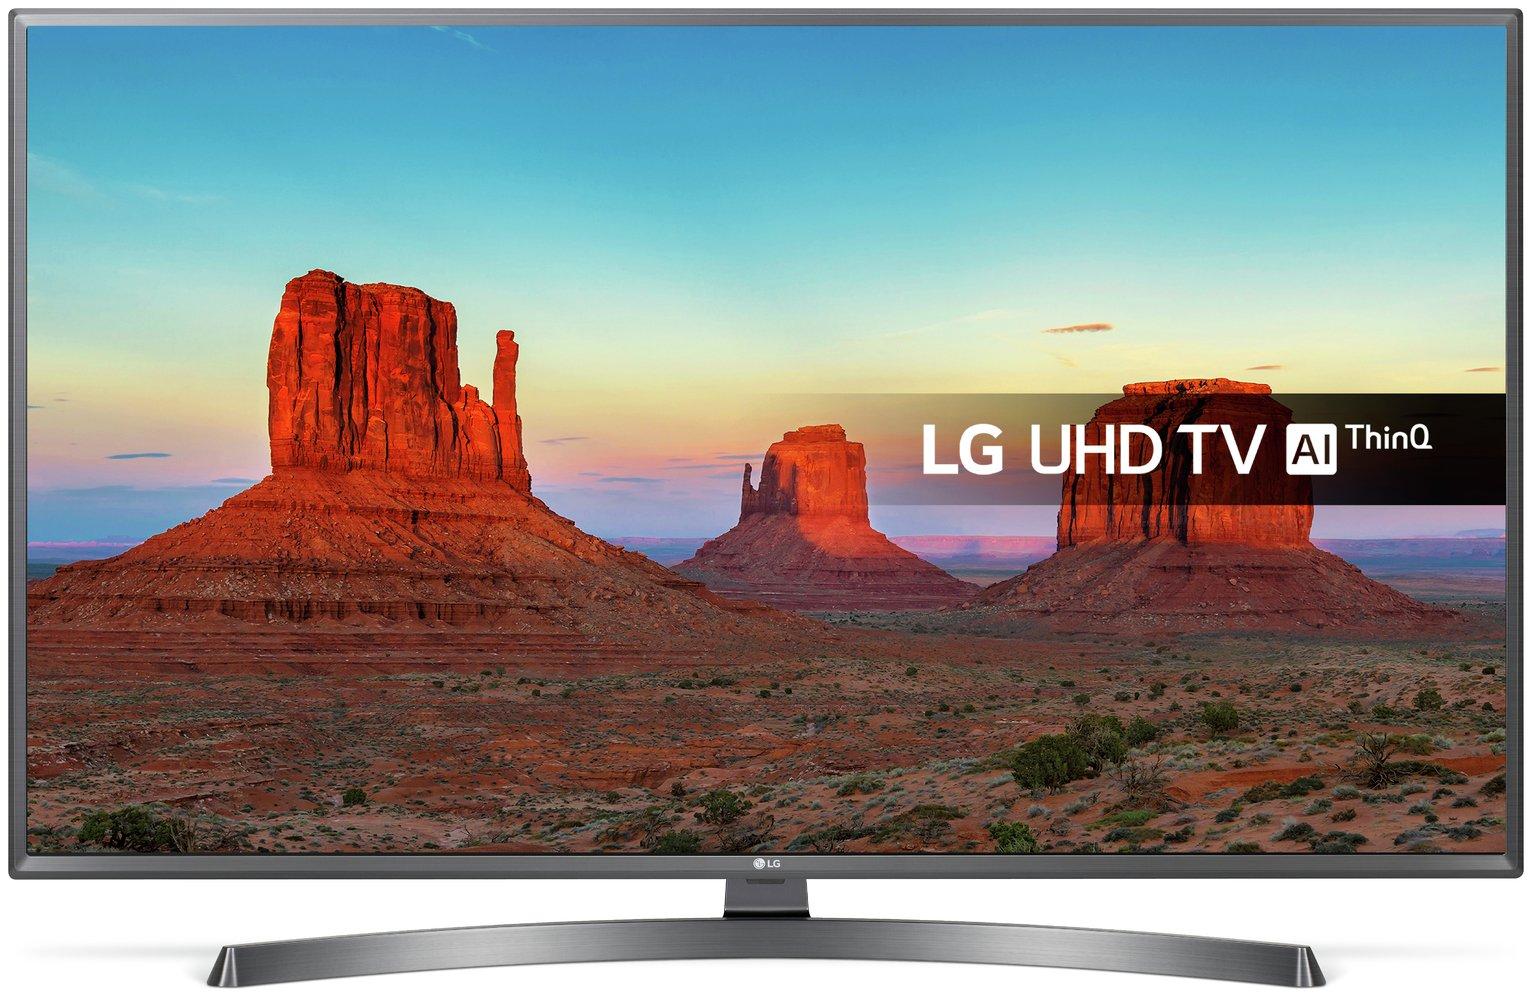 LG 55 Inch 55UK6750PLD Smart 4K HDR LED TV